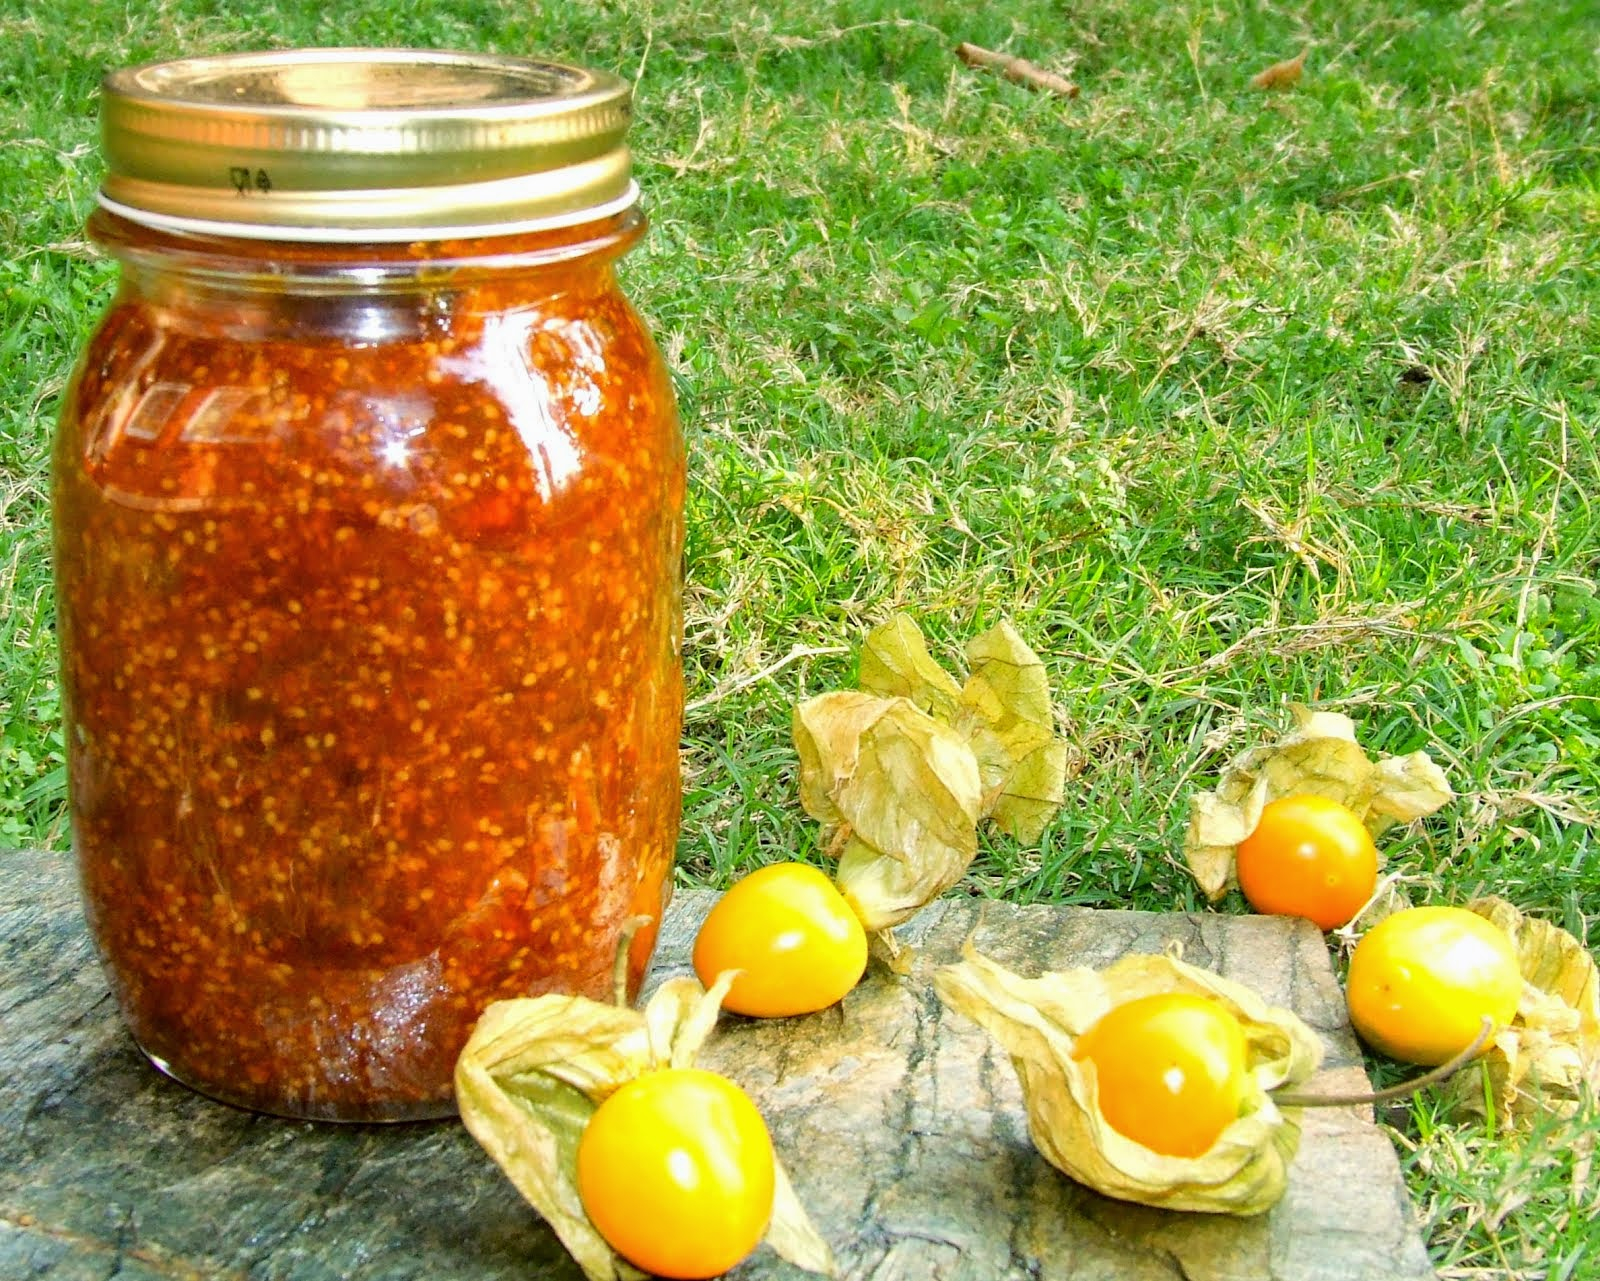 Cape Gooseberry Jam